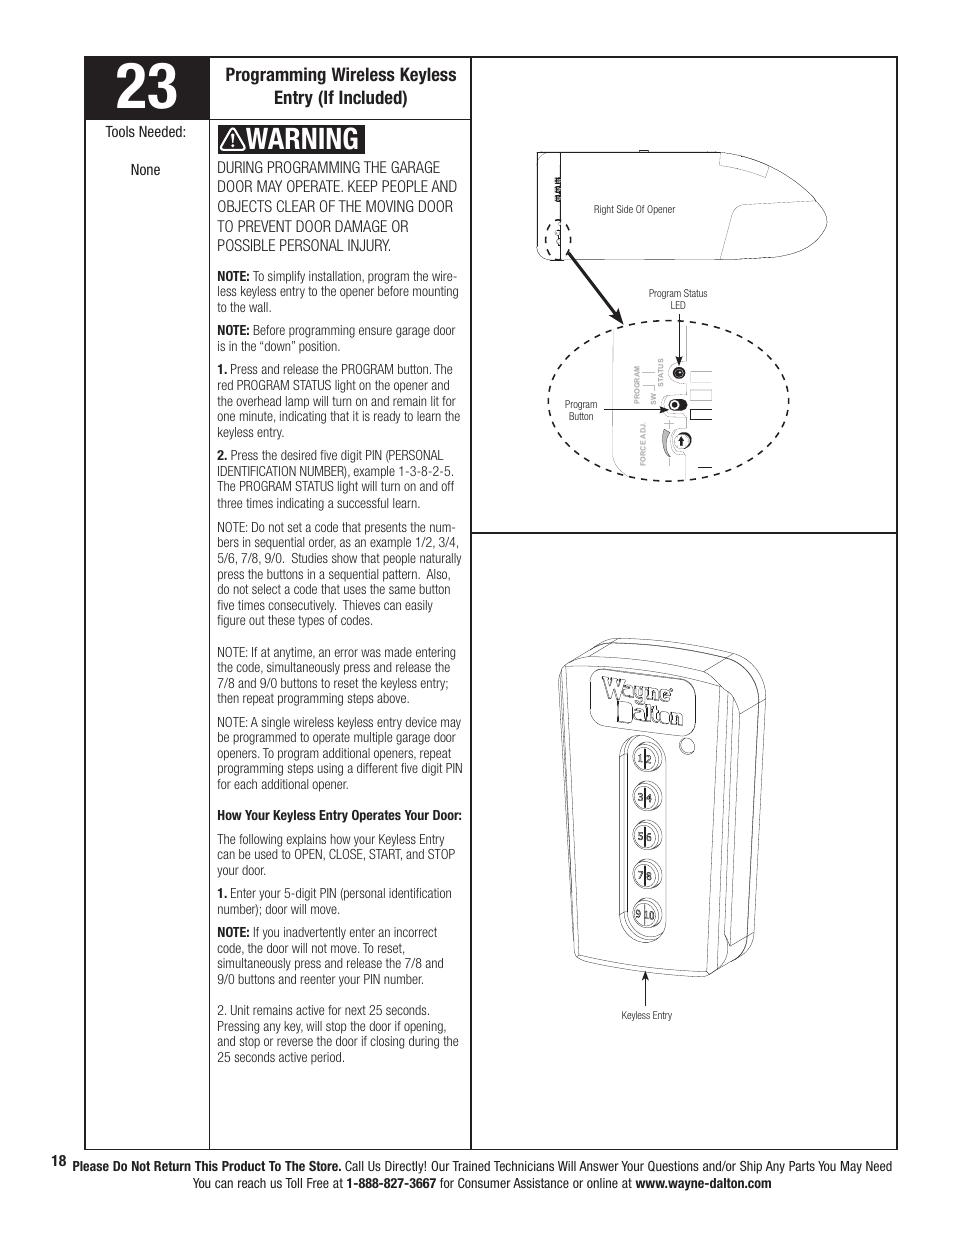 Warning, Programming wireless keyless entry (if included) | Wayne-Dalton  PRODRIVE 3221C-Z User Manual | Page 24 / 96